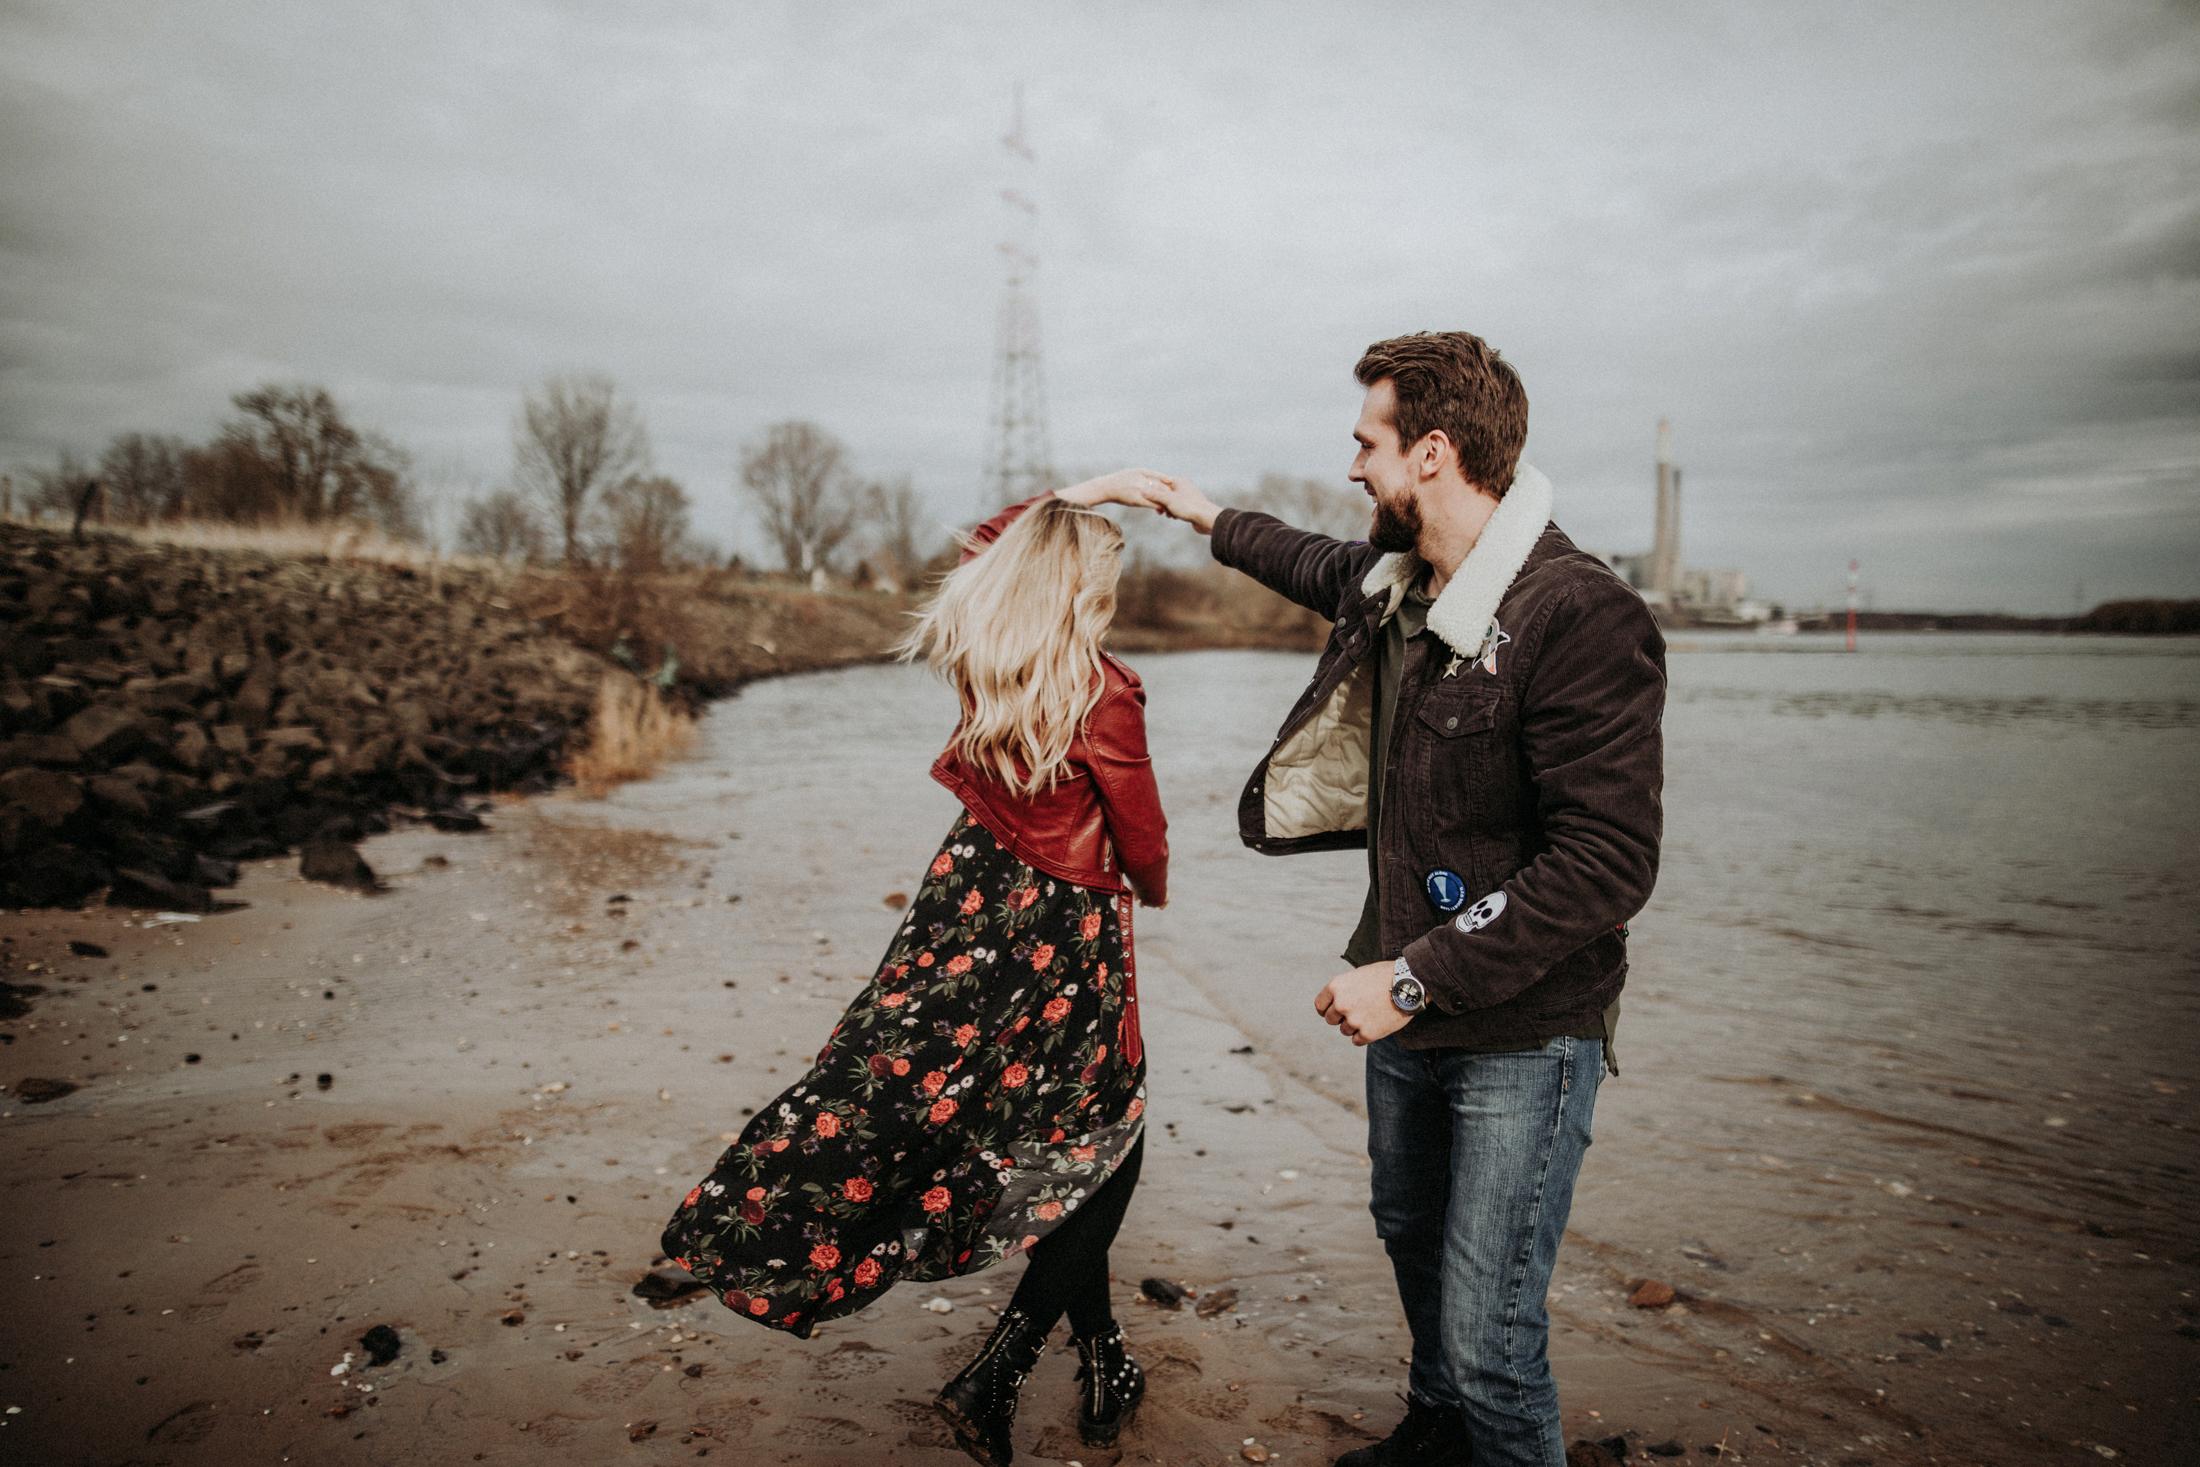 Wedding_Photographer_Mallorca_DanielaMarquardt_Photography_CanaryIslands_Lanzarote_Iceland_Tuscany_Santorini_Portugal_NewYork_Spain_Elopement_Hochzeitsfotograf_CK10